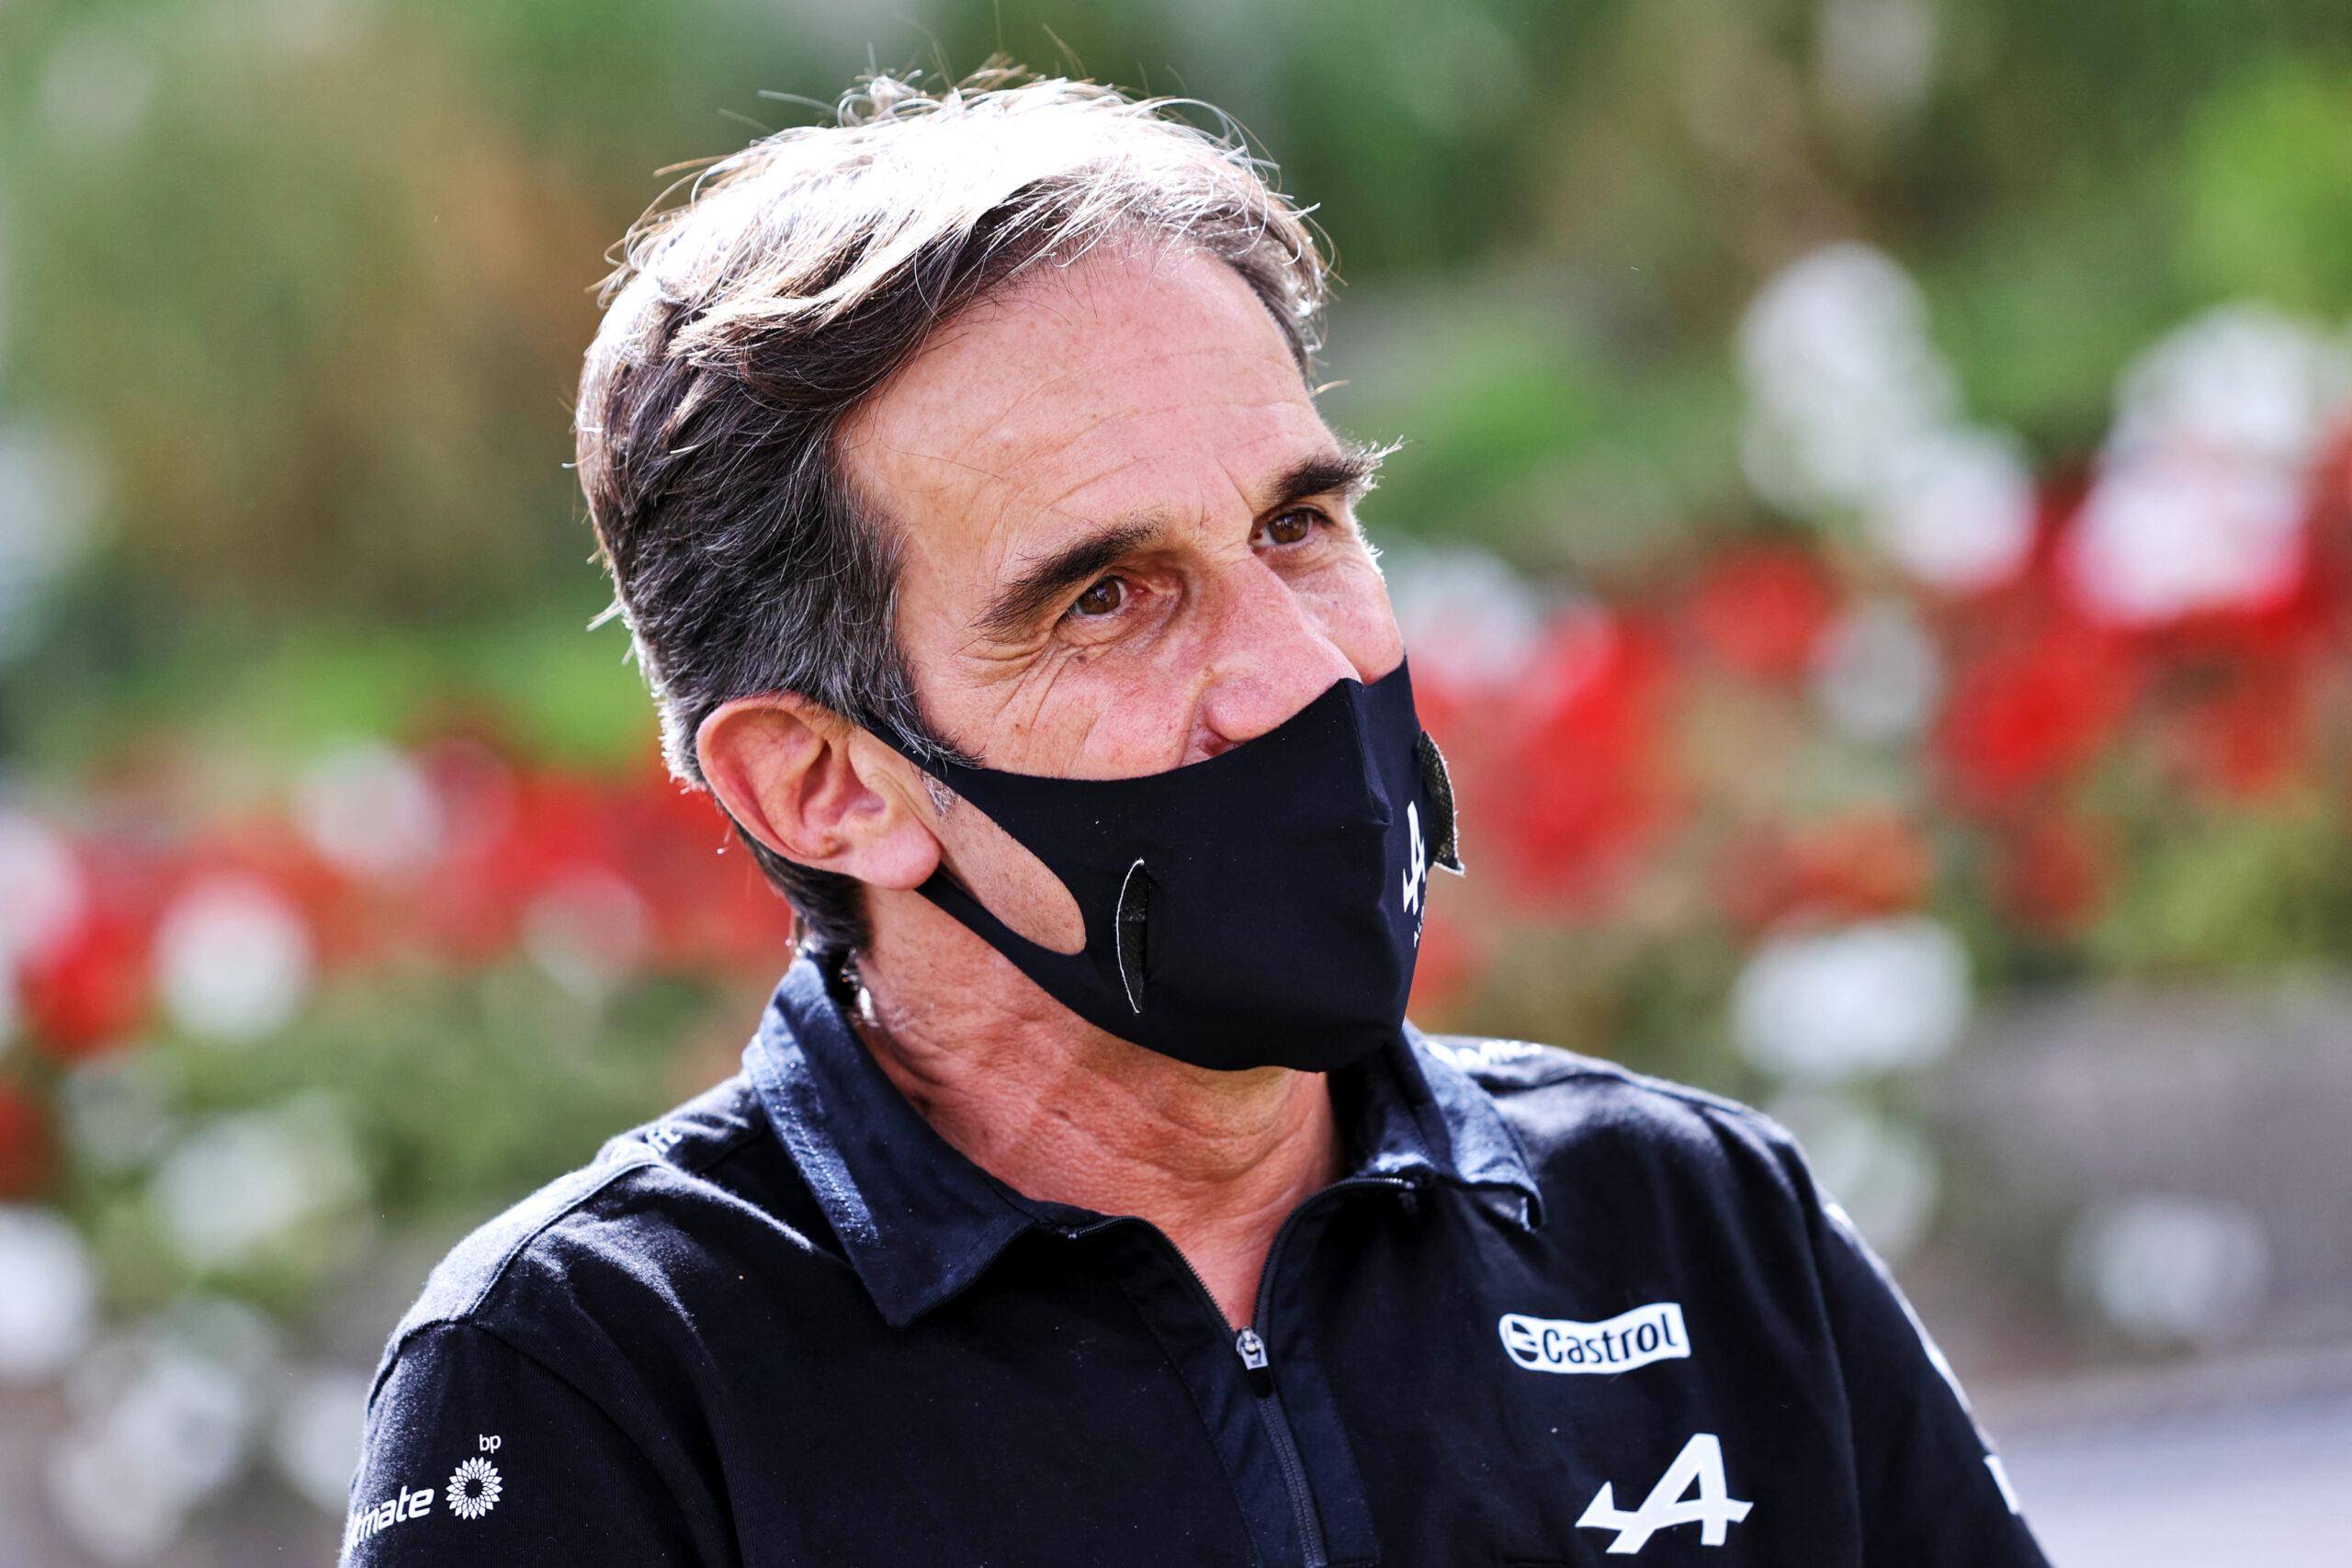 F1 - Chez Alpine F1, Davide Brivio veut maintenir l'élan insufflé par Renault